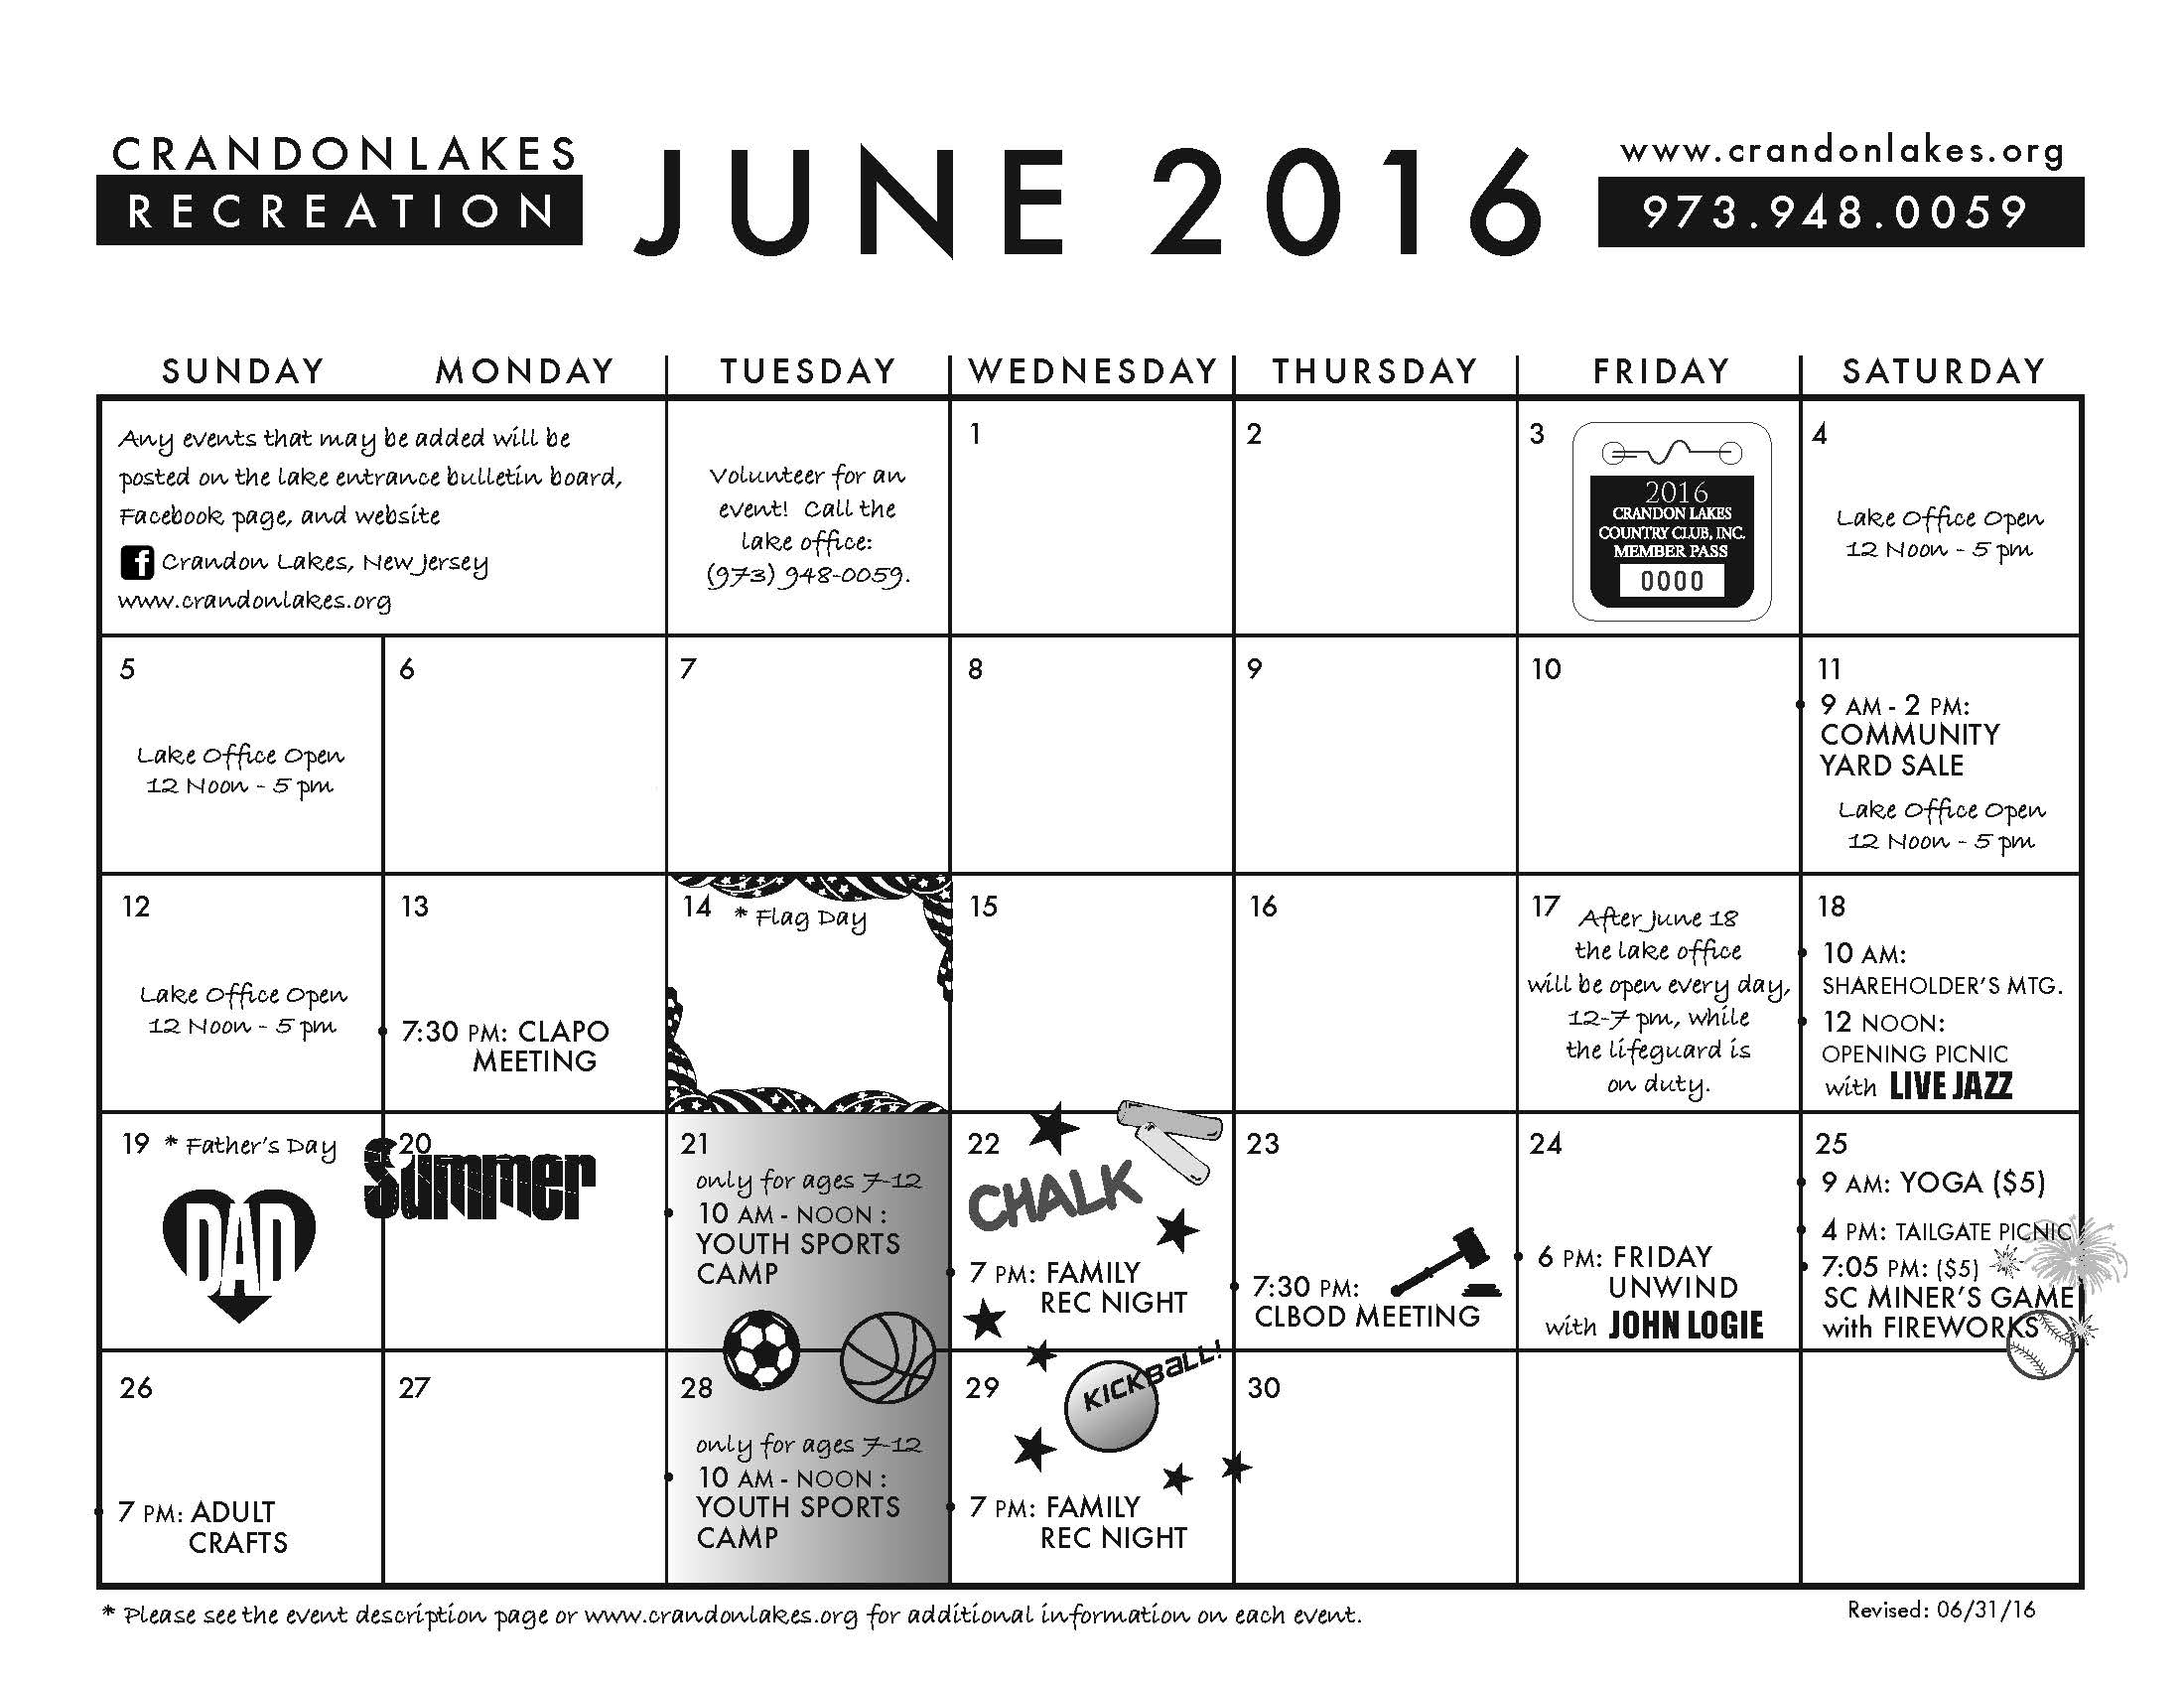 June 2016 Crandon Lakes Recreation Calendar